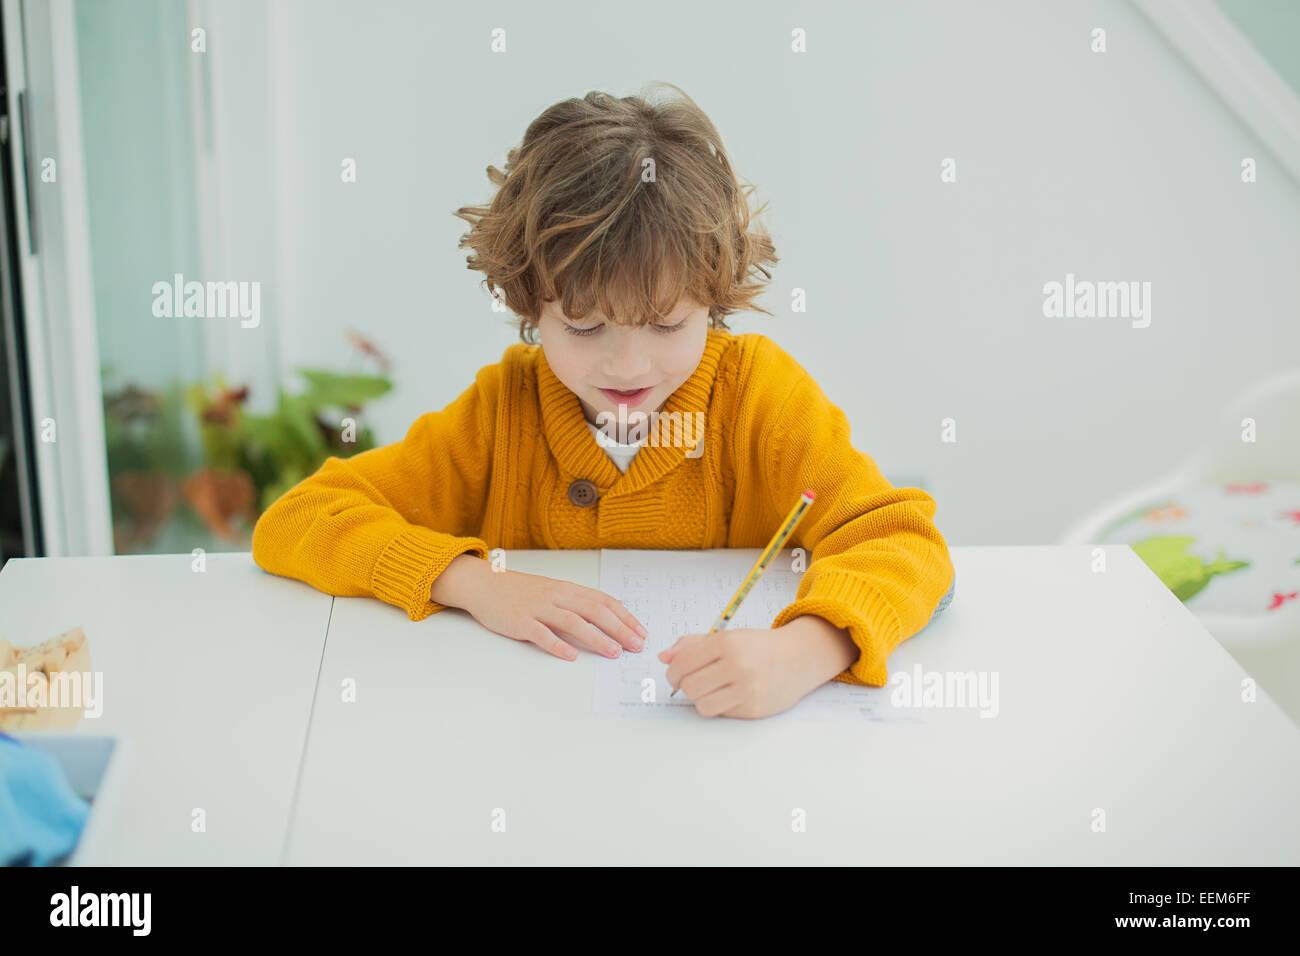 Boy (6-7) doing homework - Stock Image